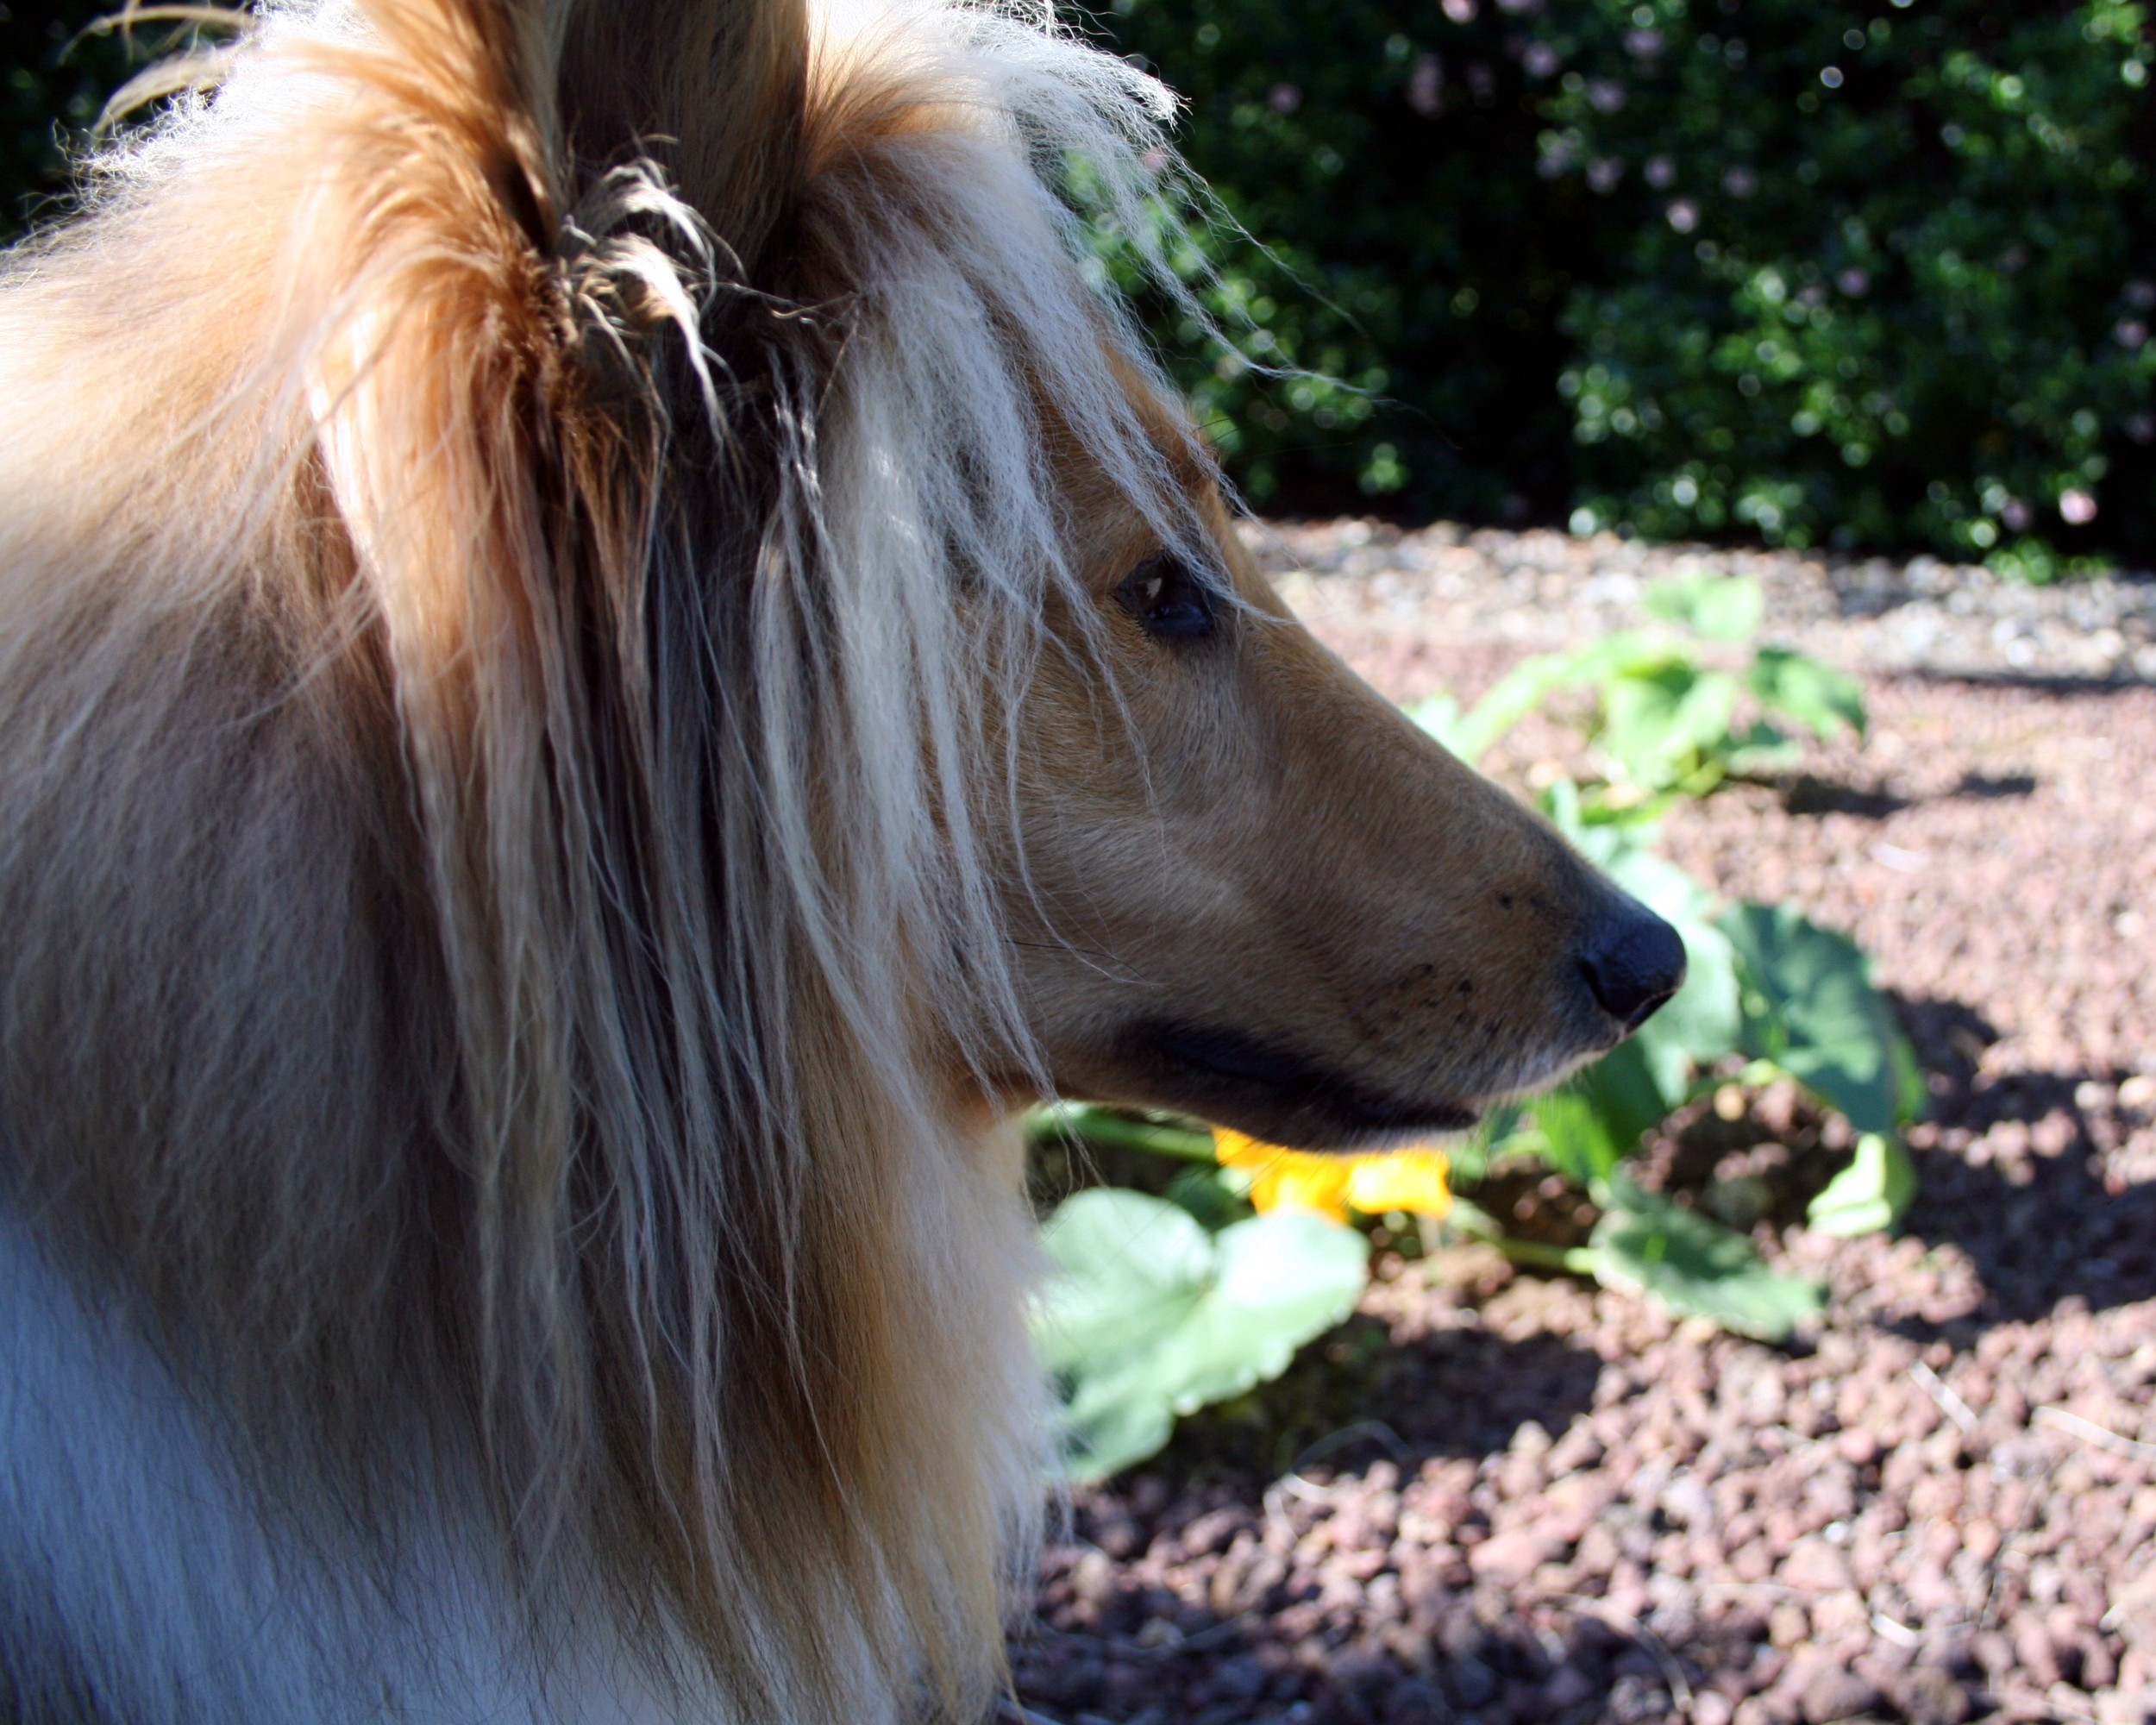 Guard Dog of the Royal Zucchini